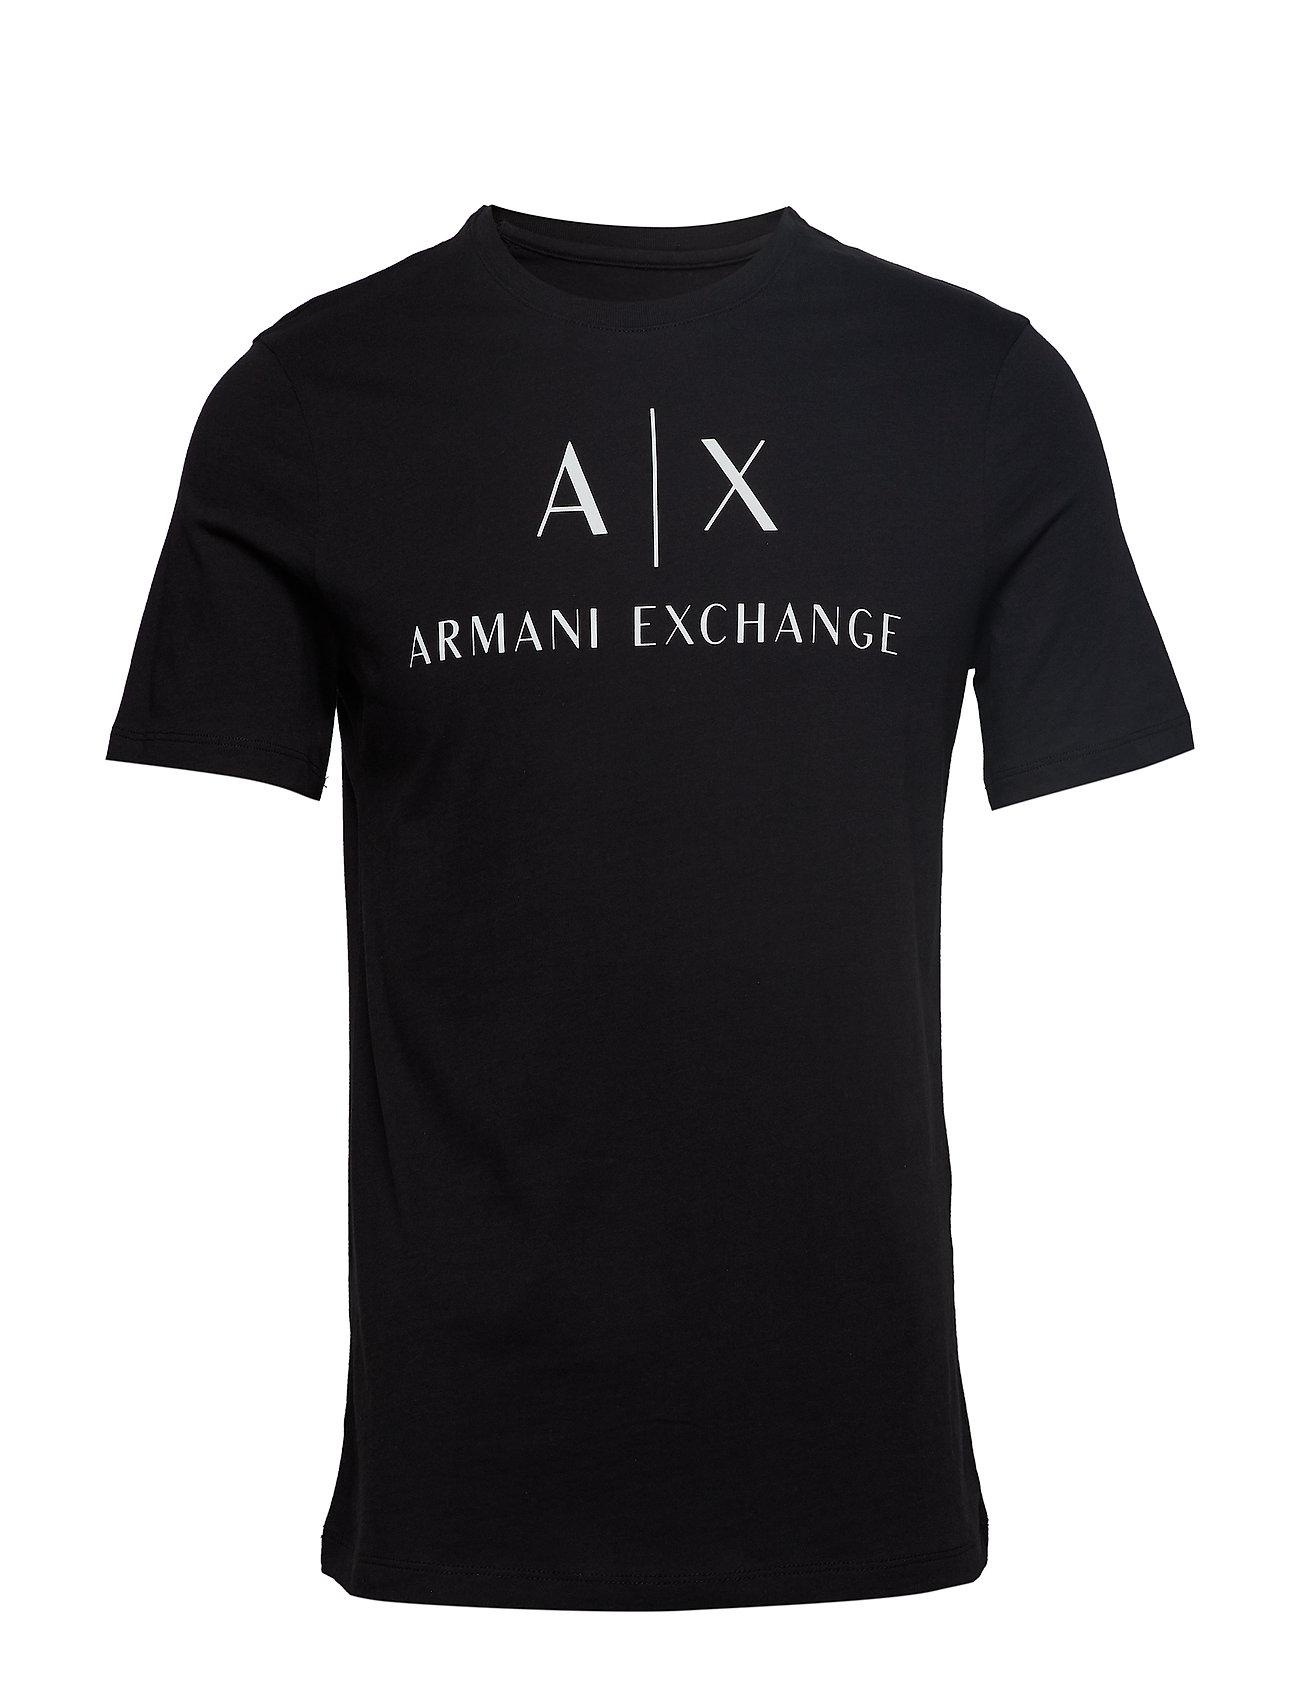 Jersey Jersey shirtblackArmani Jersey T Man T shirtblackArmani Exchange Man Exchange Man 92IDWEH